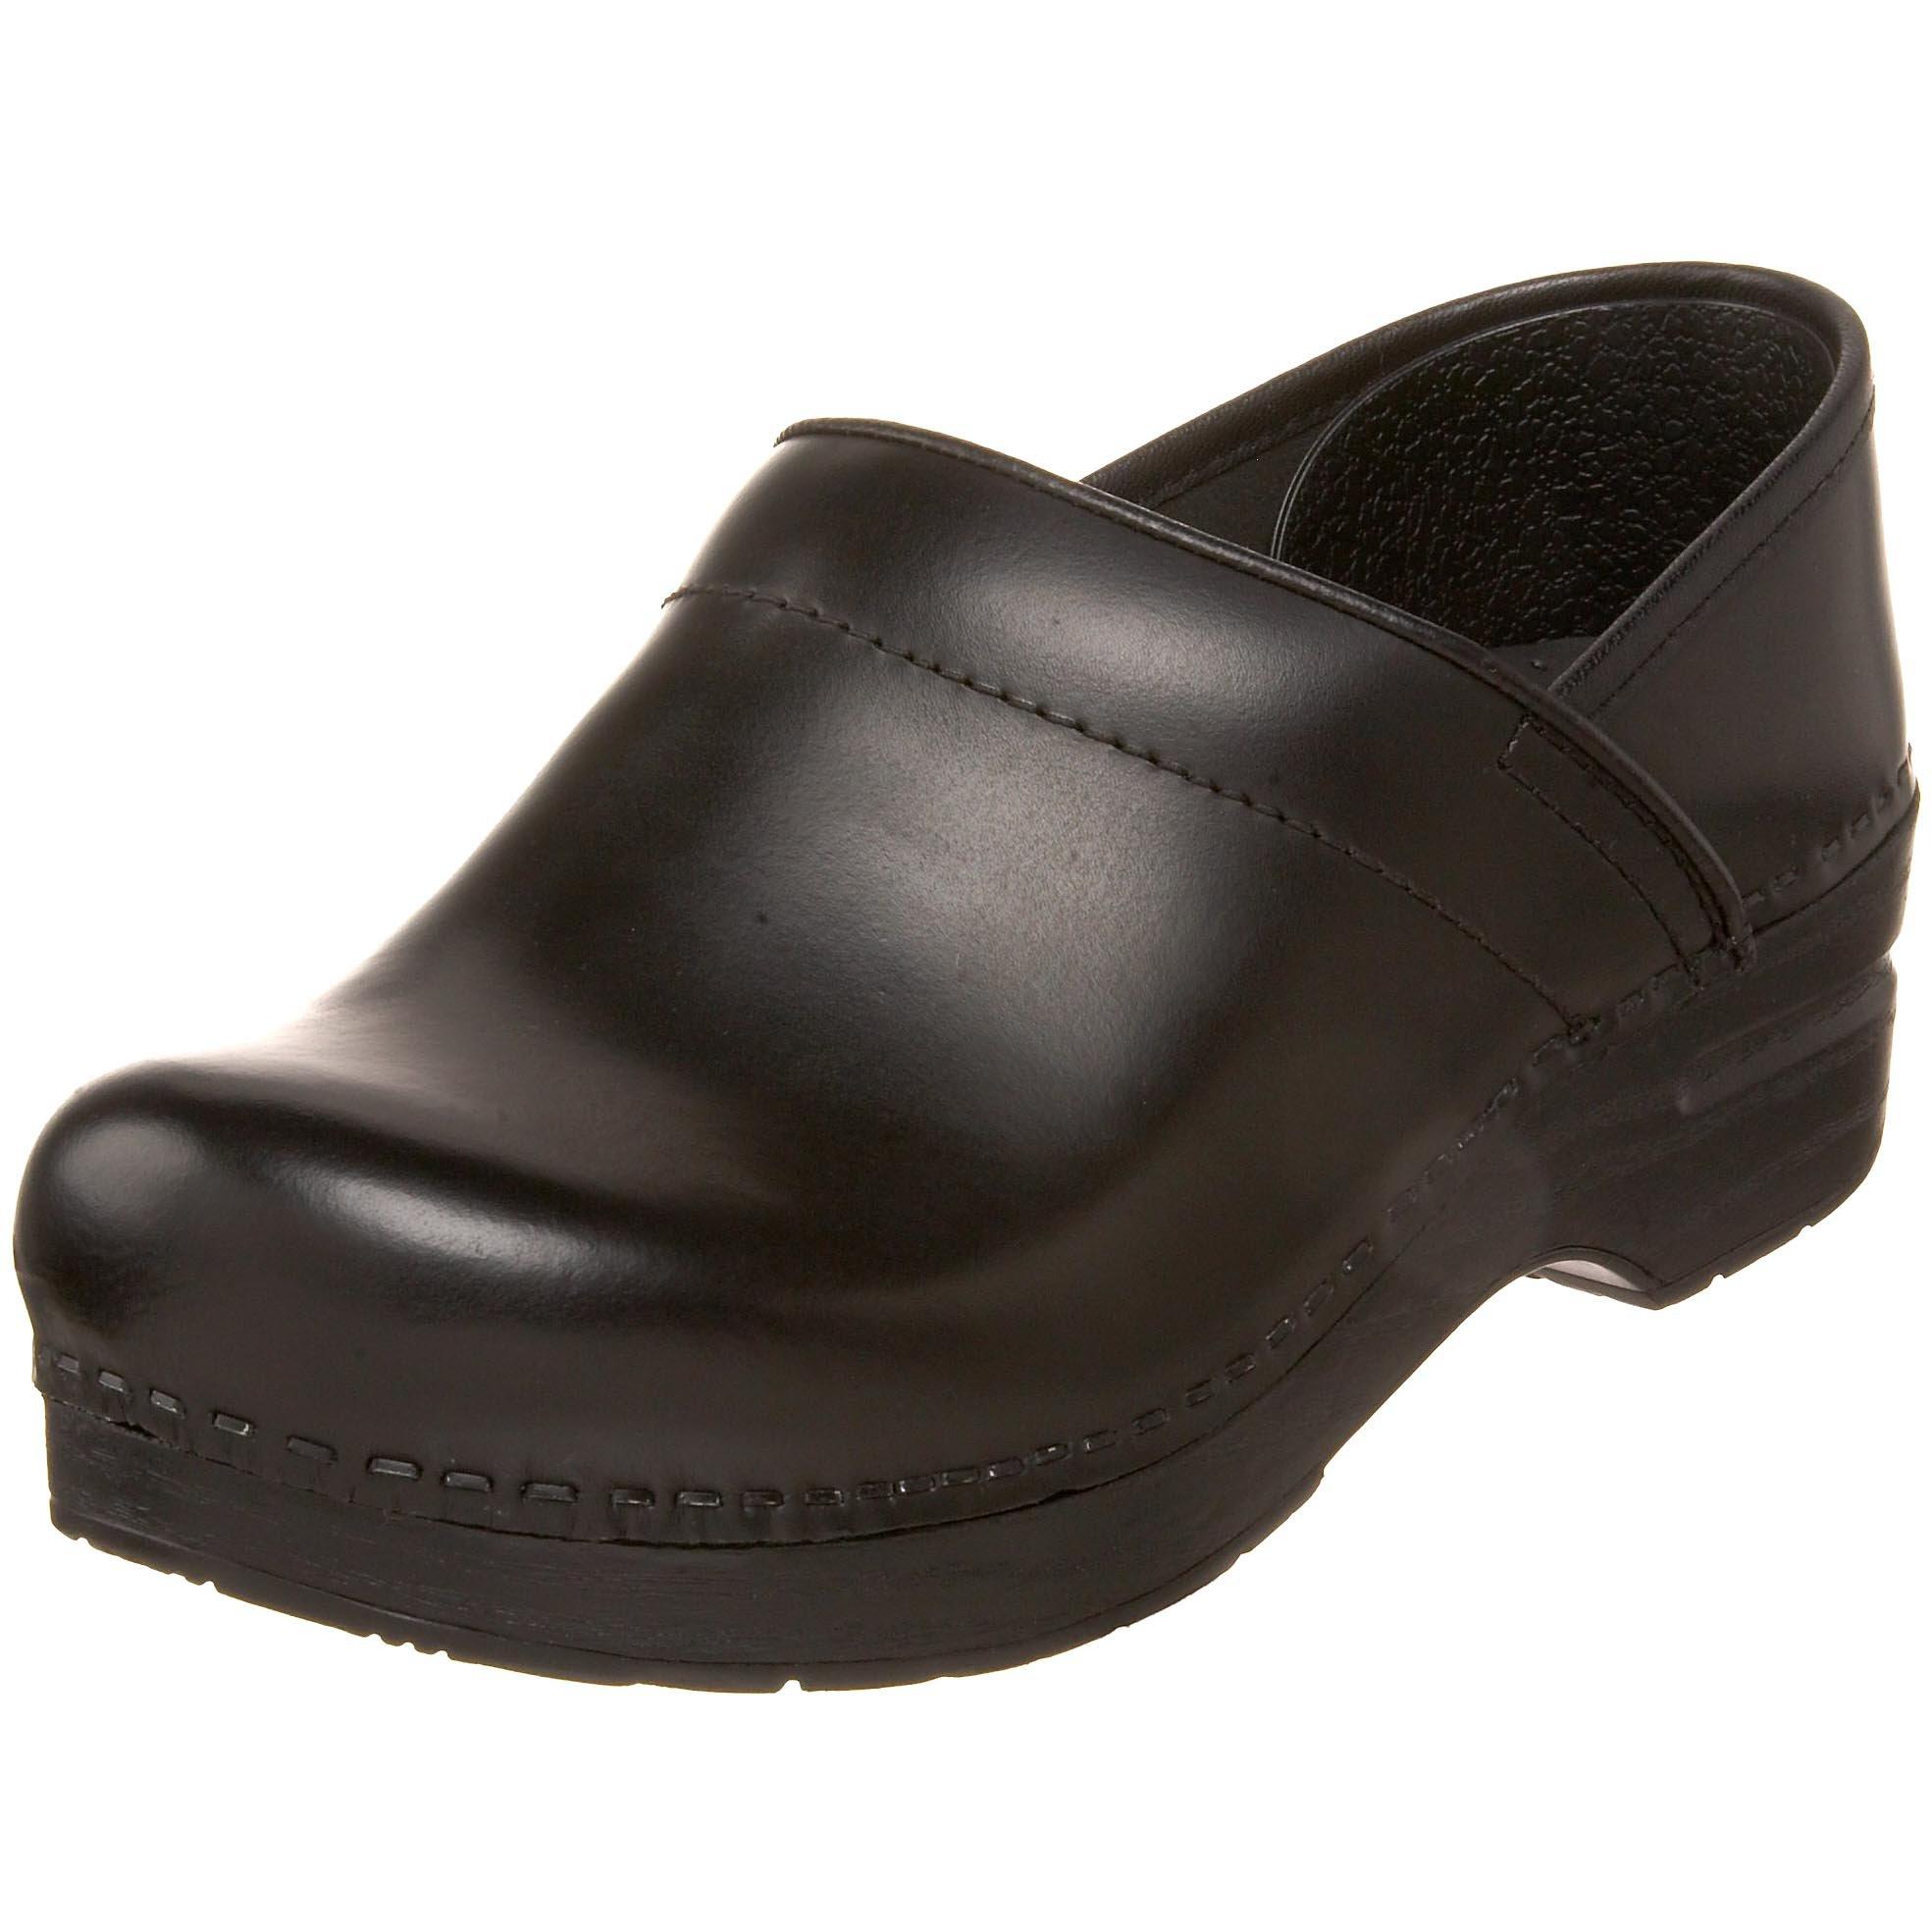 Dansko Women's Wide Professional Clog,Black Cabrio,40 W EU / 9.5-10 D(W) US